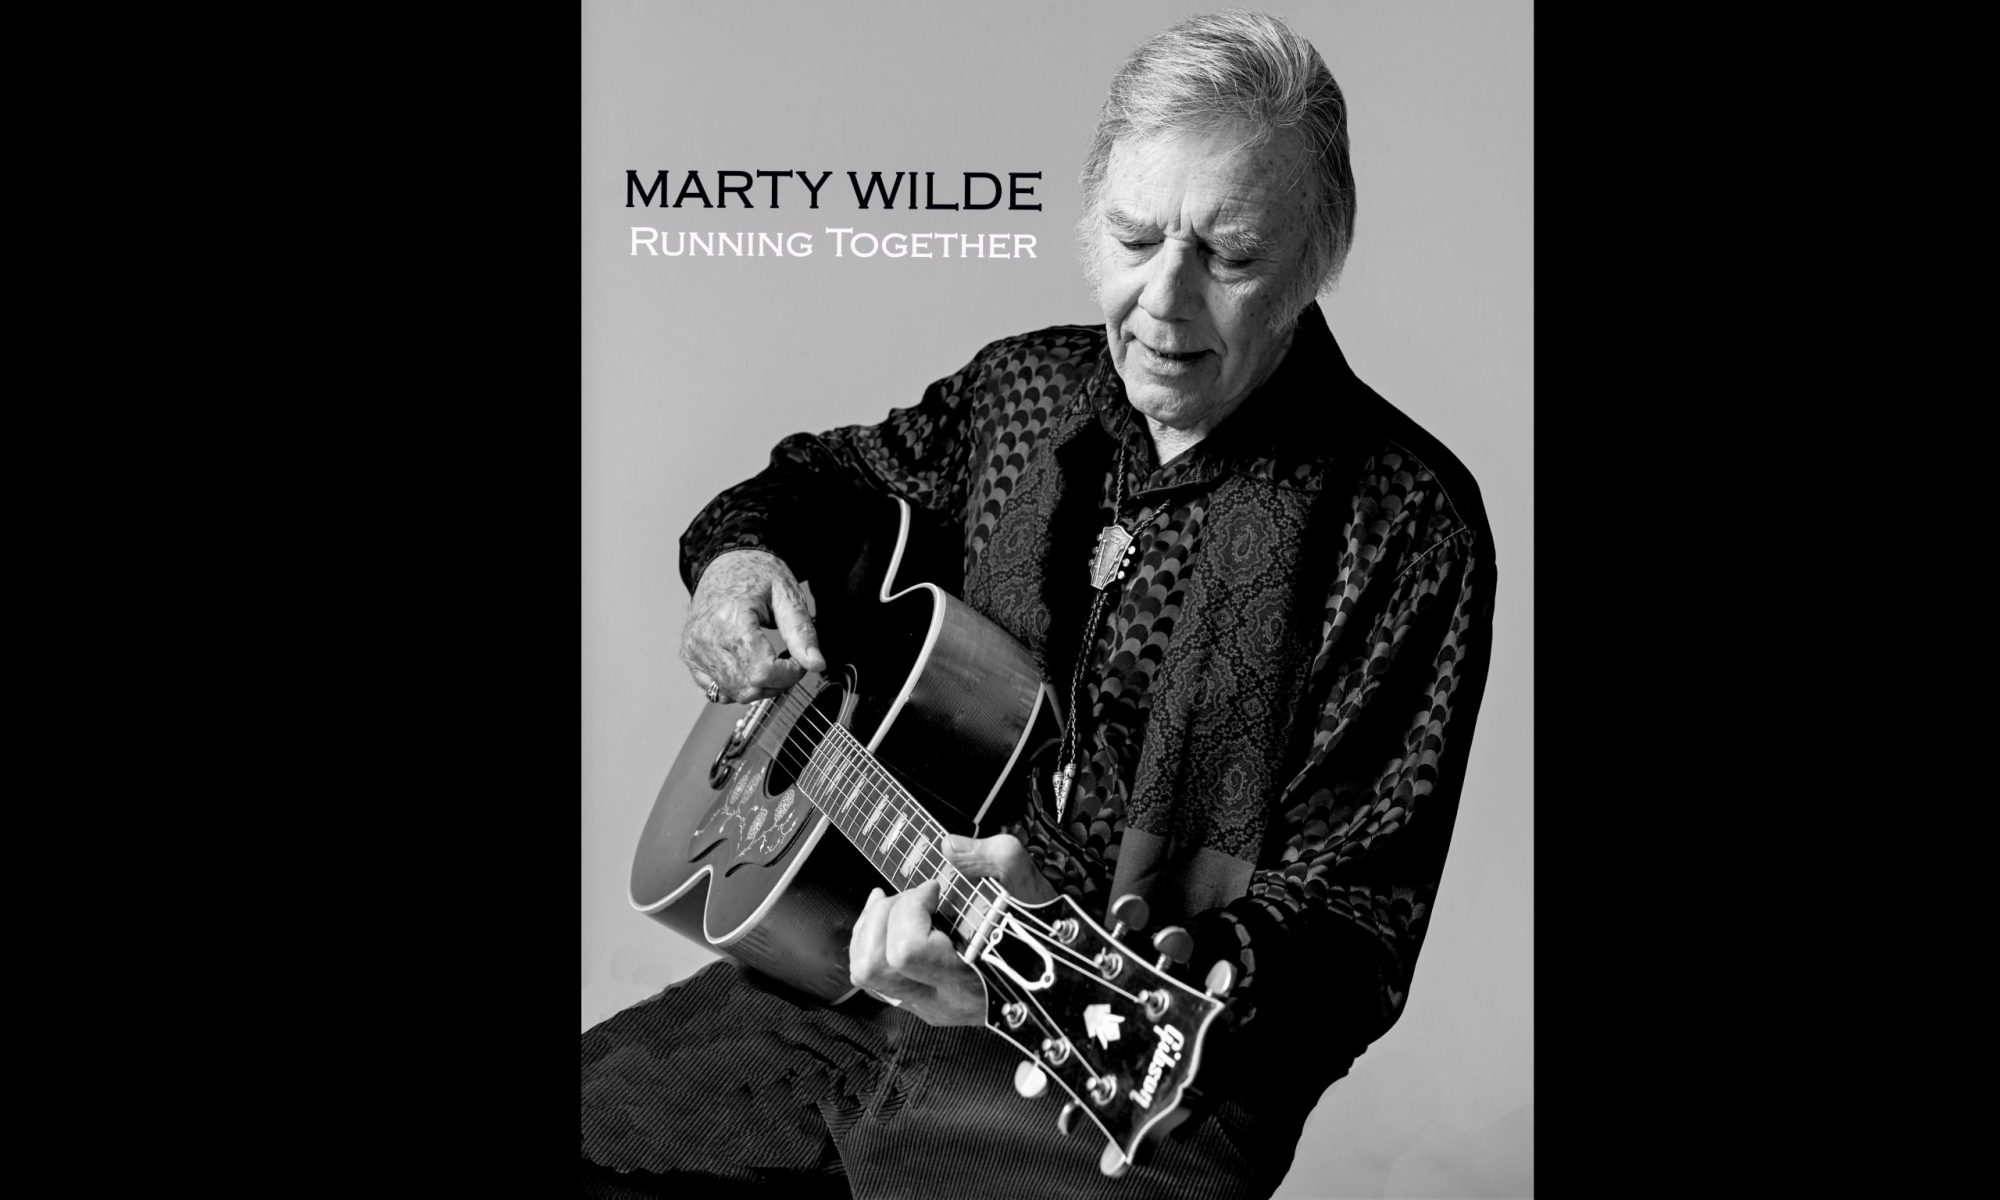 MARTY WILDE MBE